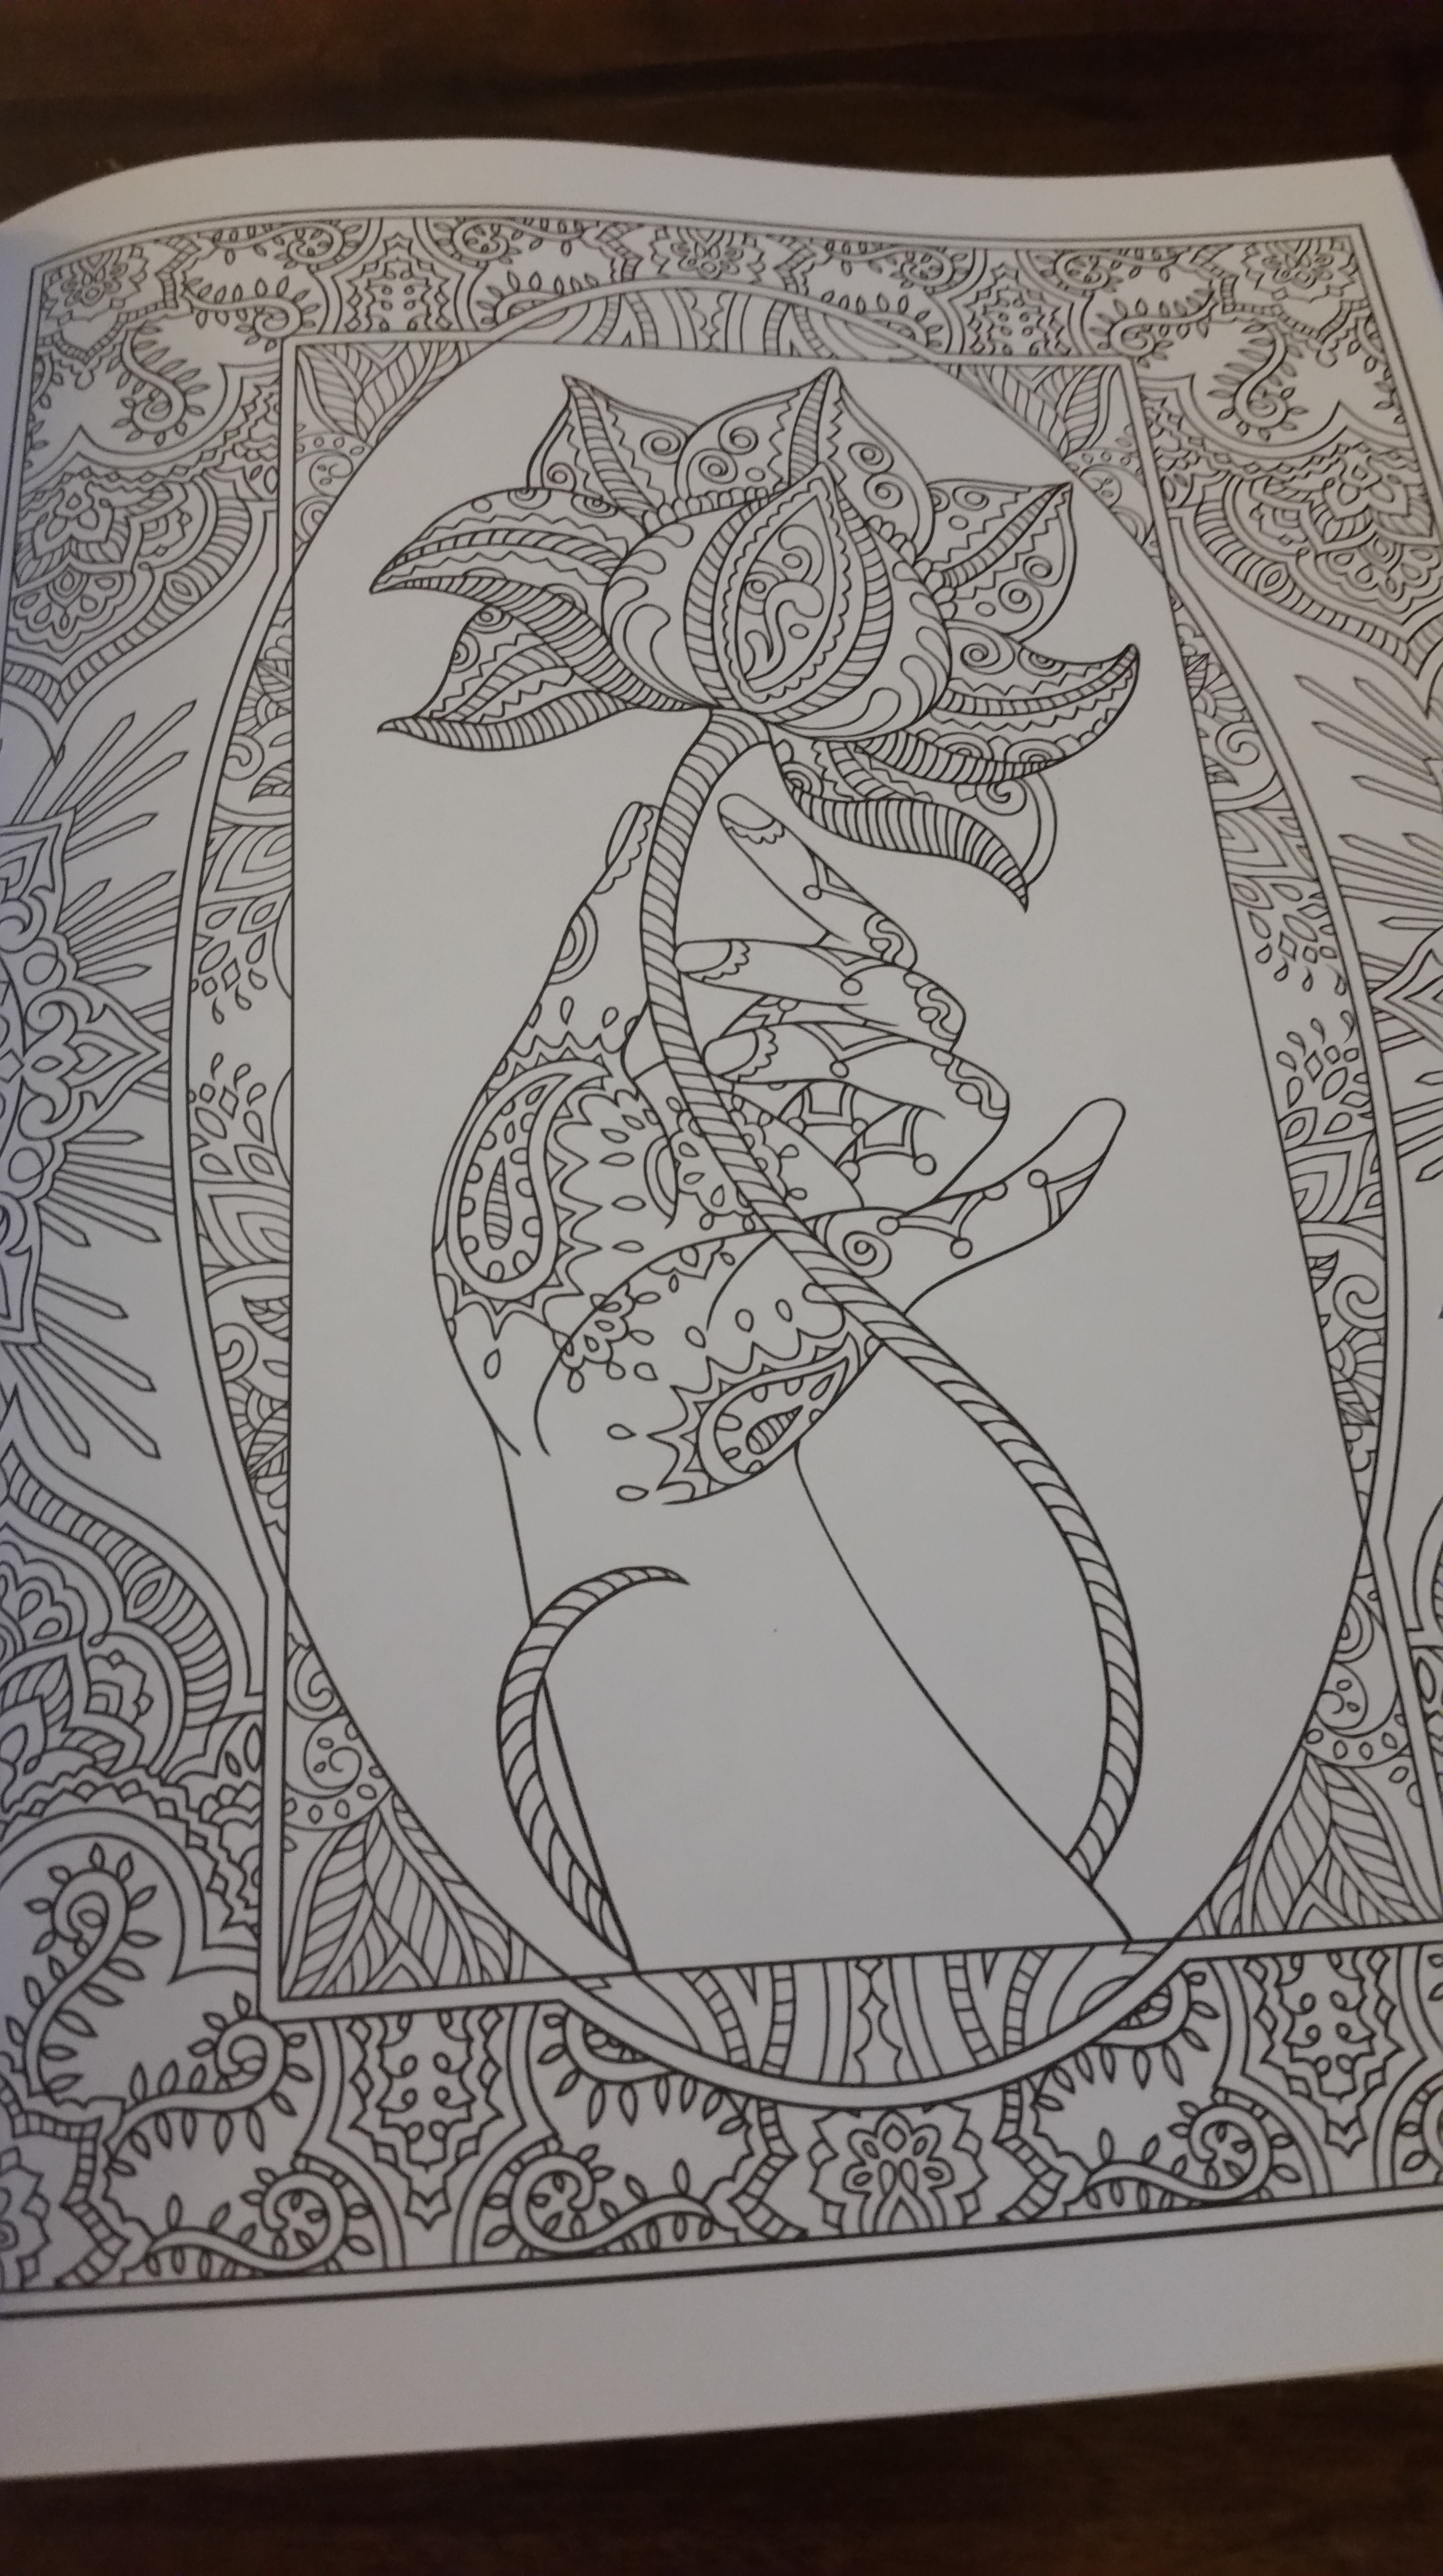 The secret garden coloring book barnes and noble - 20150904_191759 20150904_191816